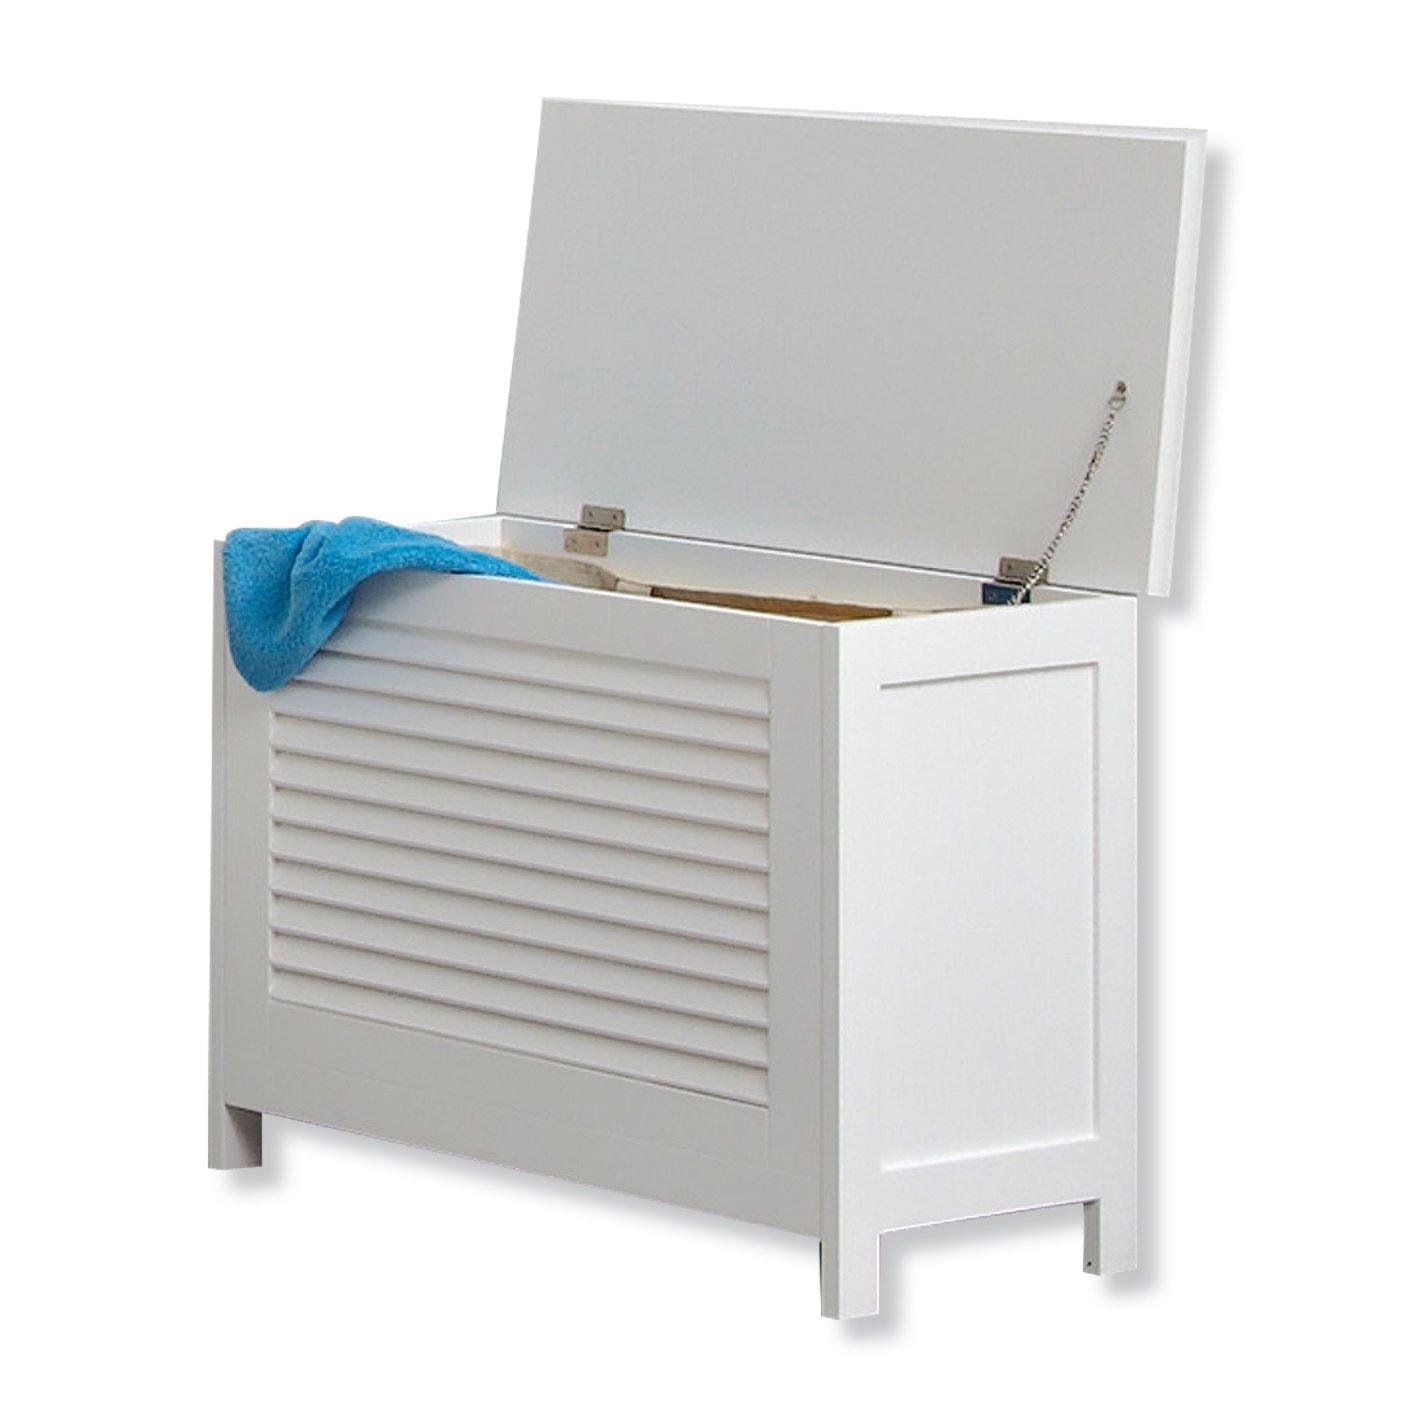 klebefolie badezimmer hausgestaltung ideen. Black Bedroom Furniture Sets. Home Design Ideas